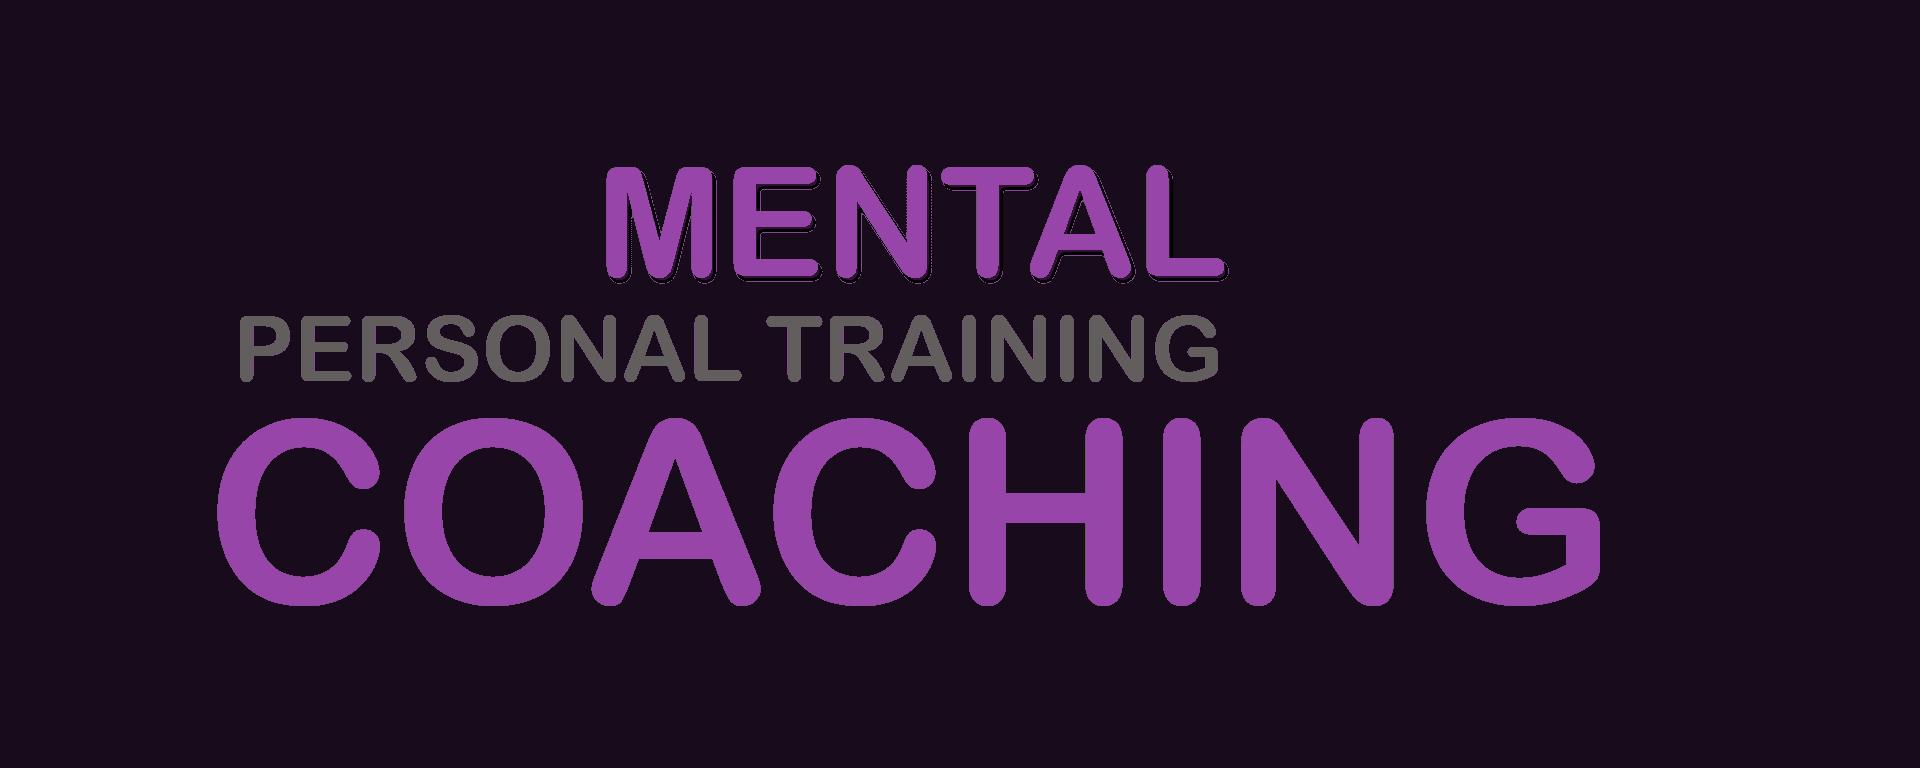 Personal-training-mental-coaching